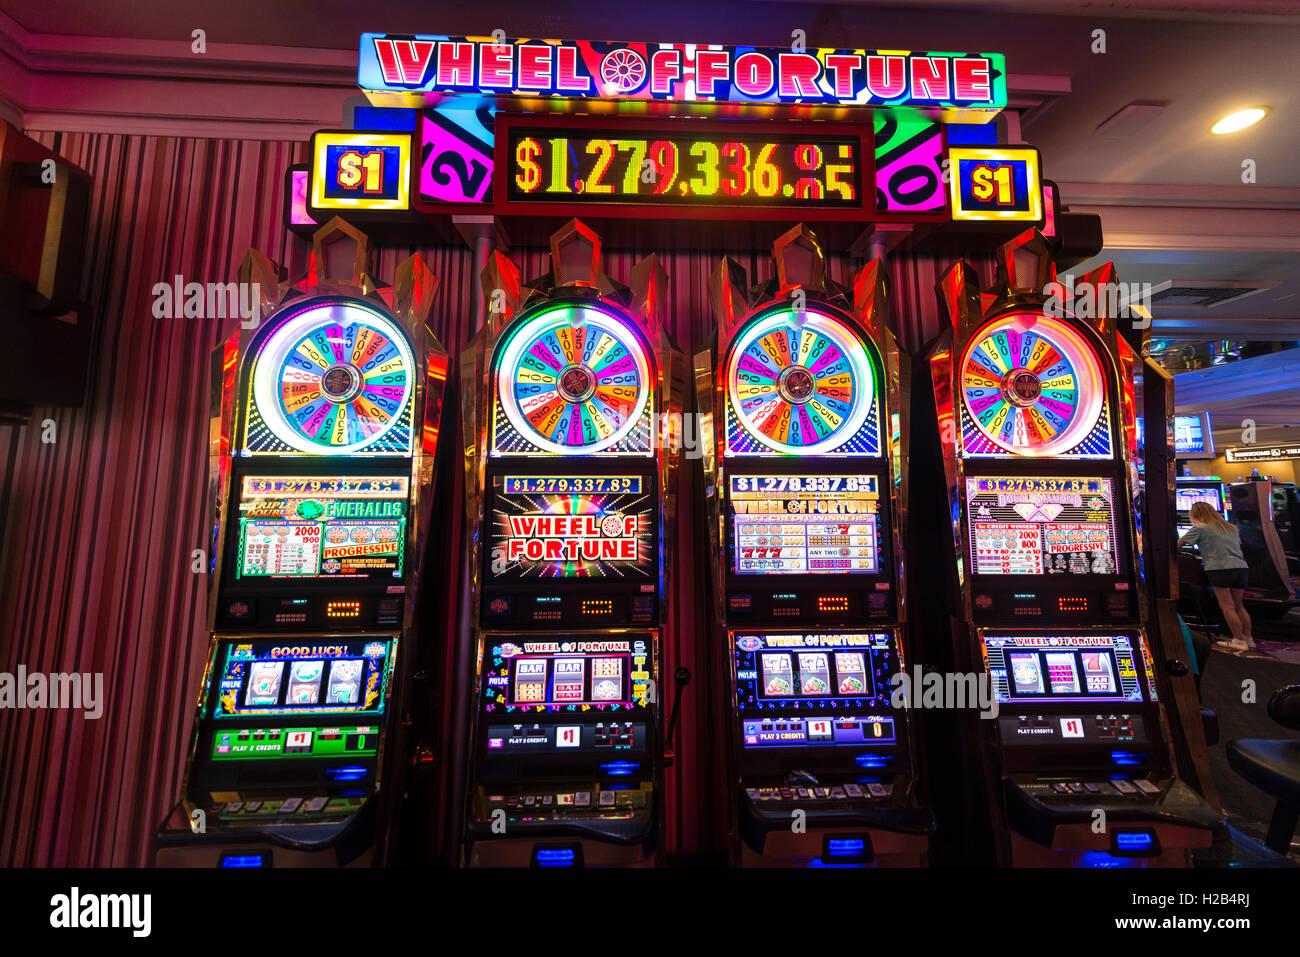 Slots, Wheel of Fortune at casino, Las Vegas, Nevada, USA Stock Photo